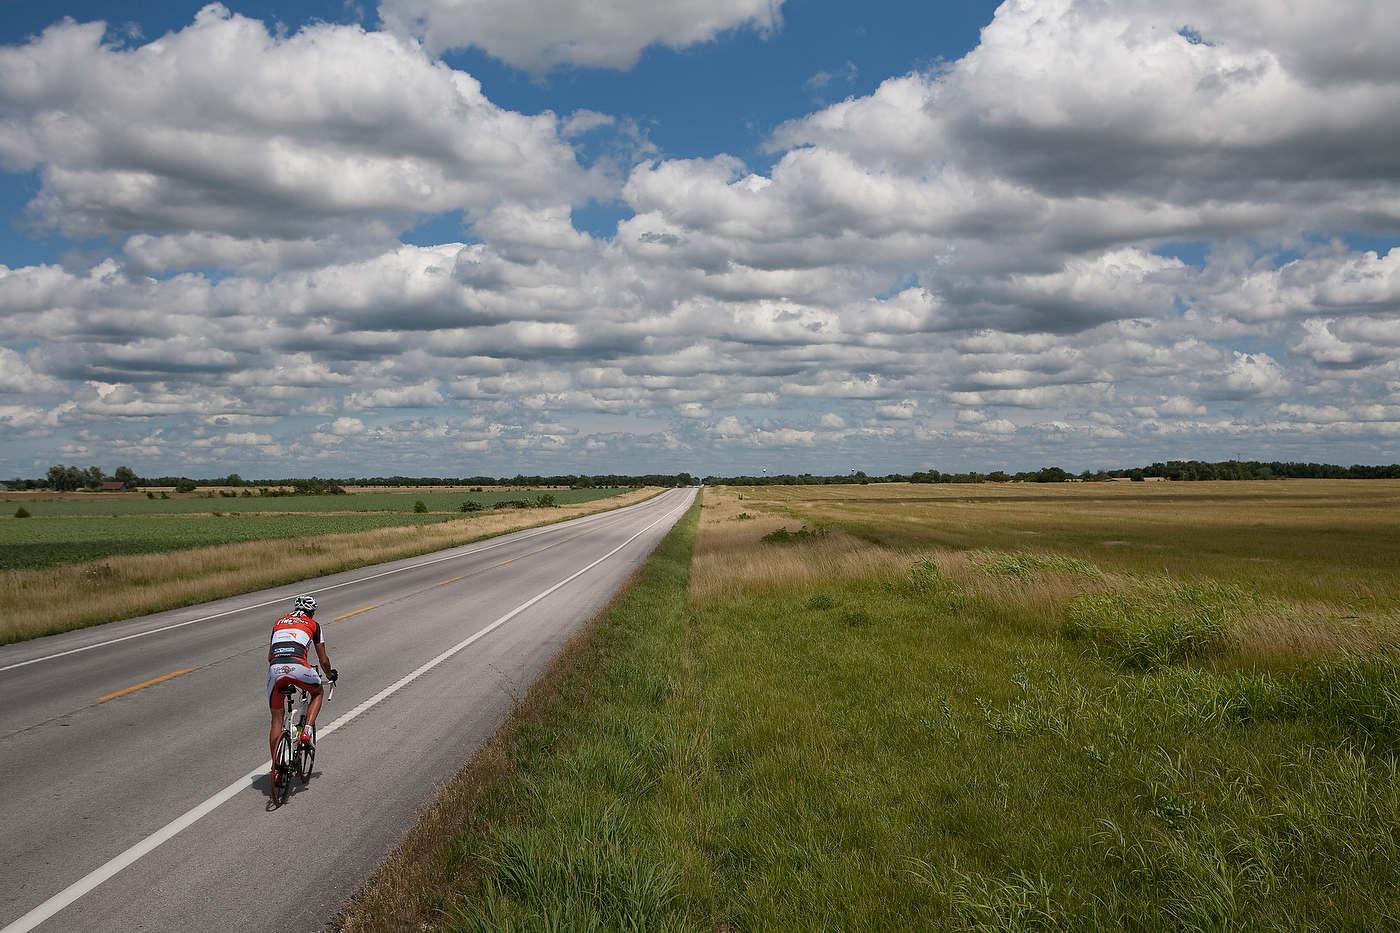 Race Across America, for l'Equipe Magazine.